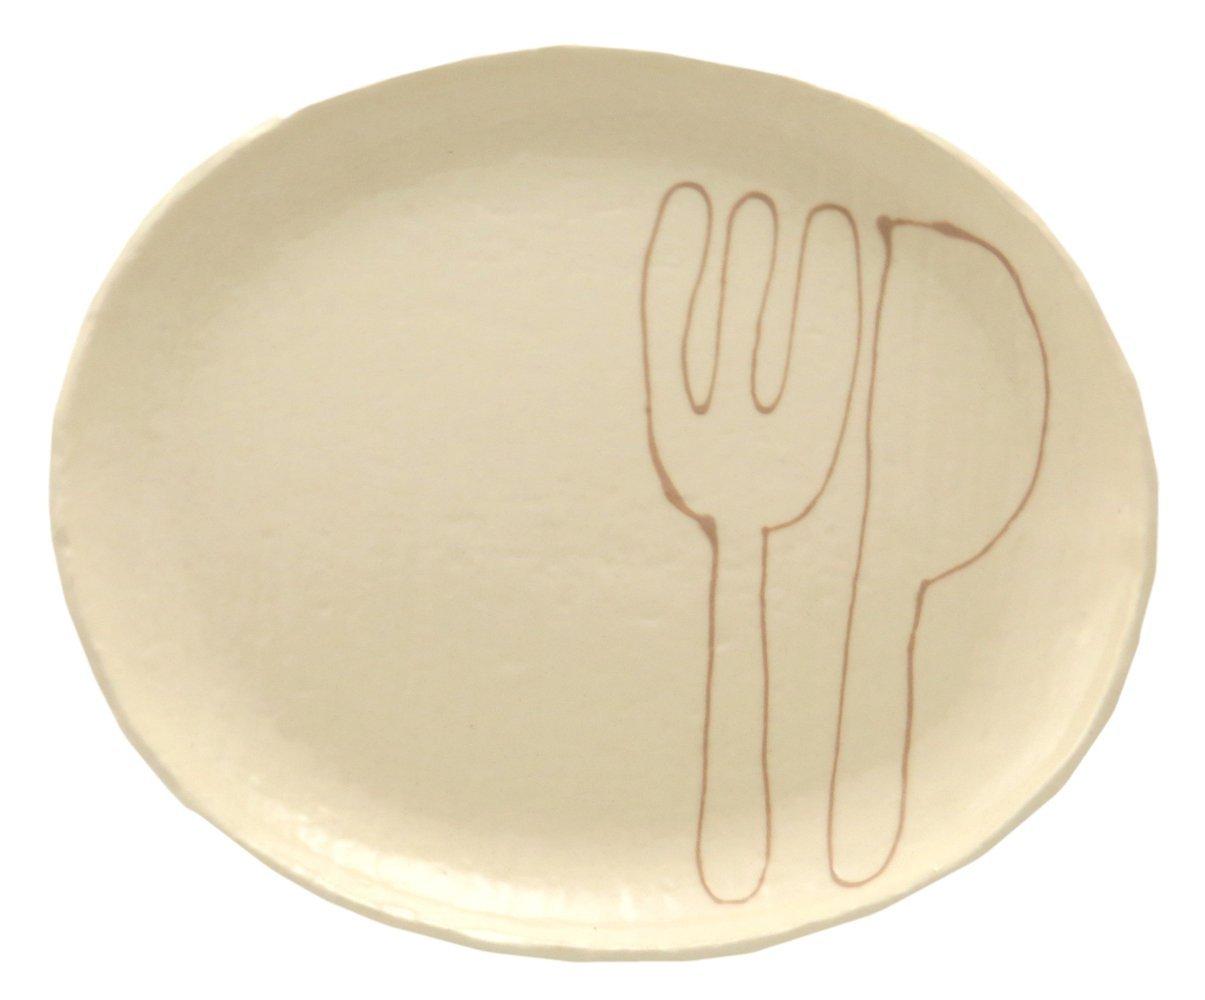 23cmのメイン用3サイズの大きいお皿【小判皿大(フォーク&ナイフモカ)】